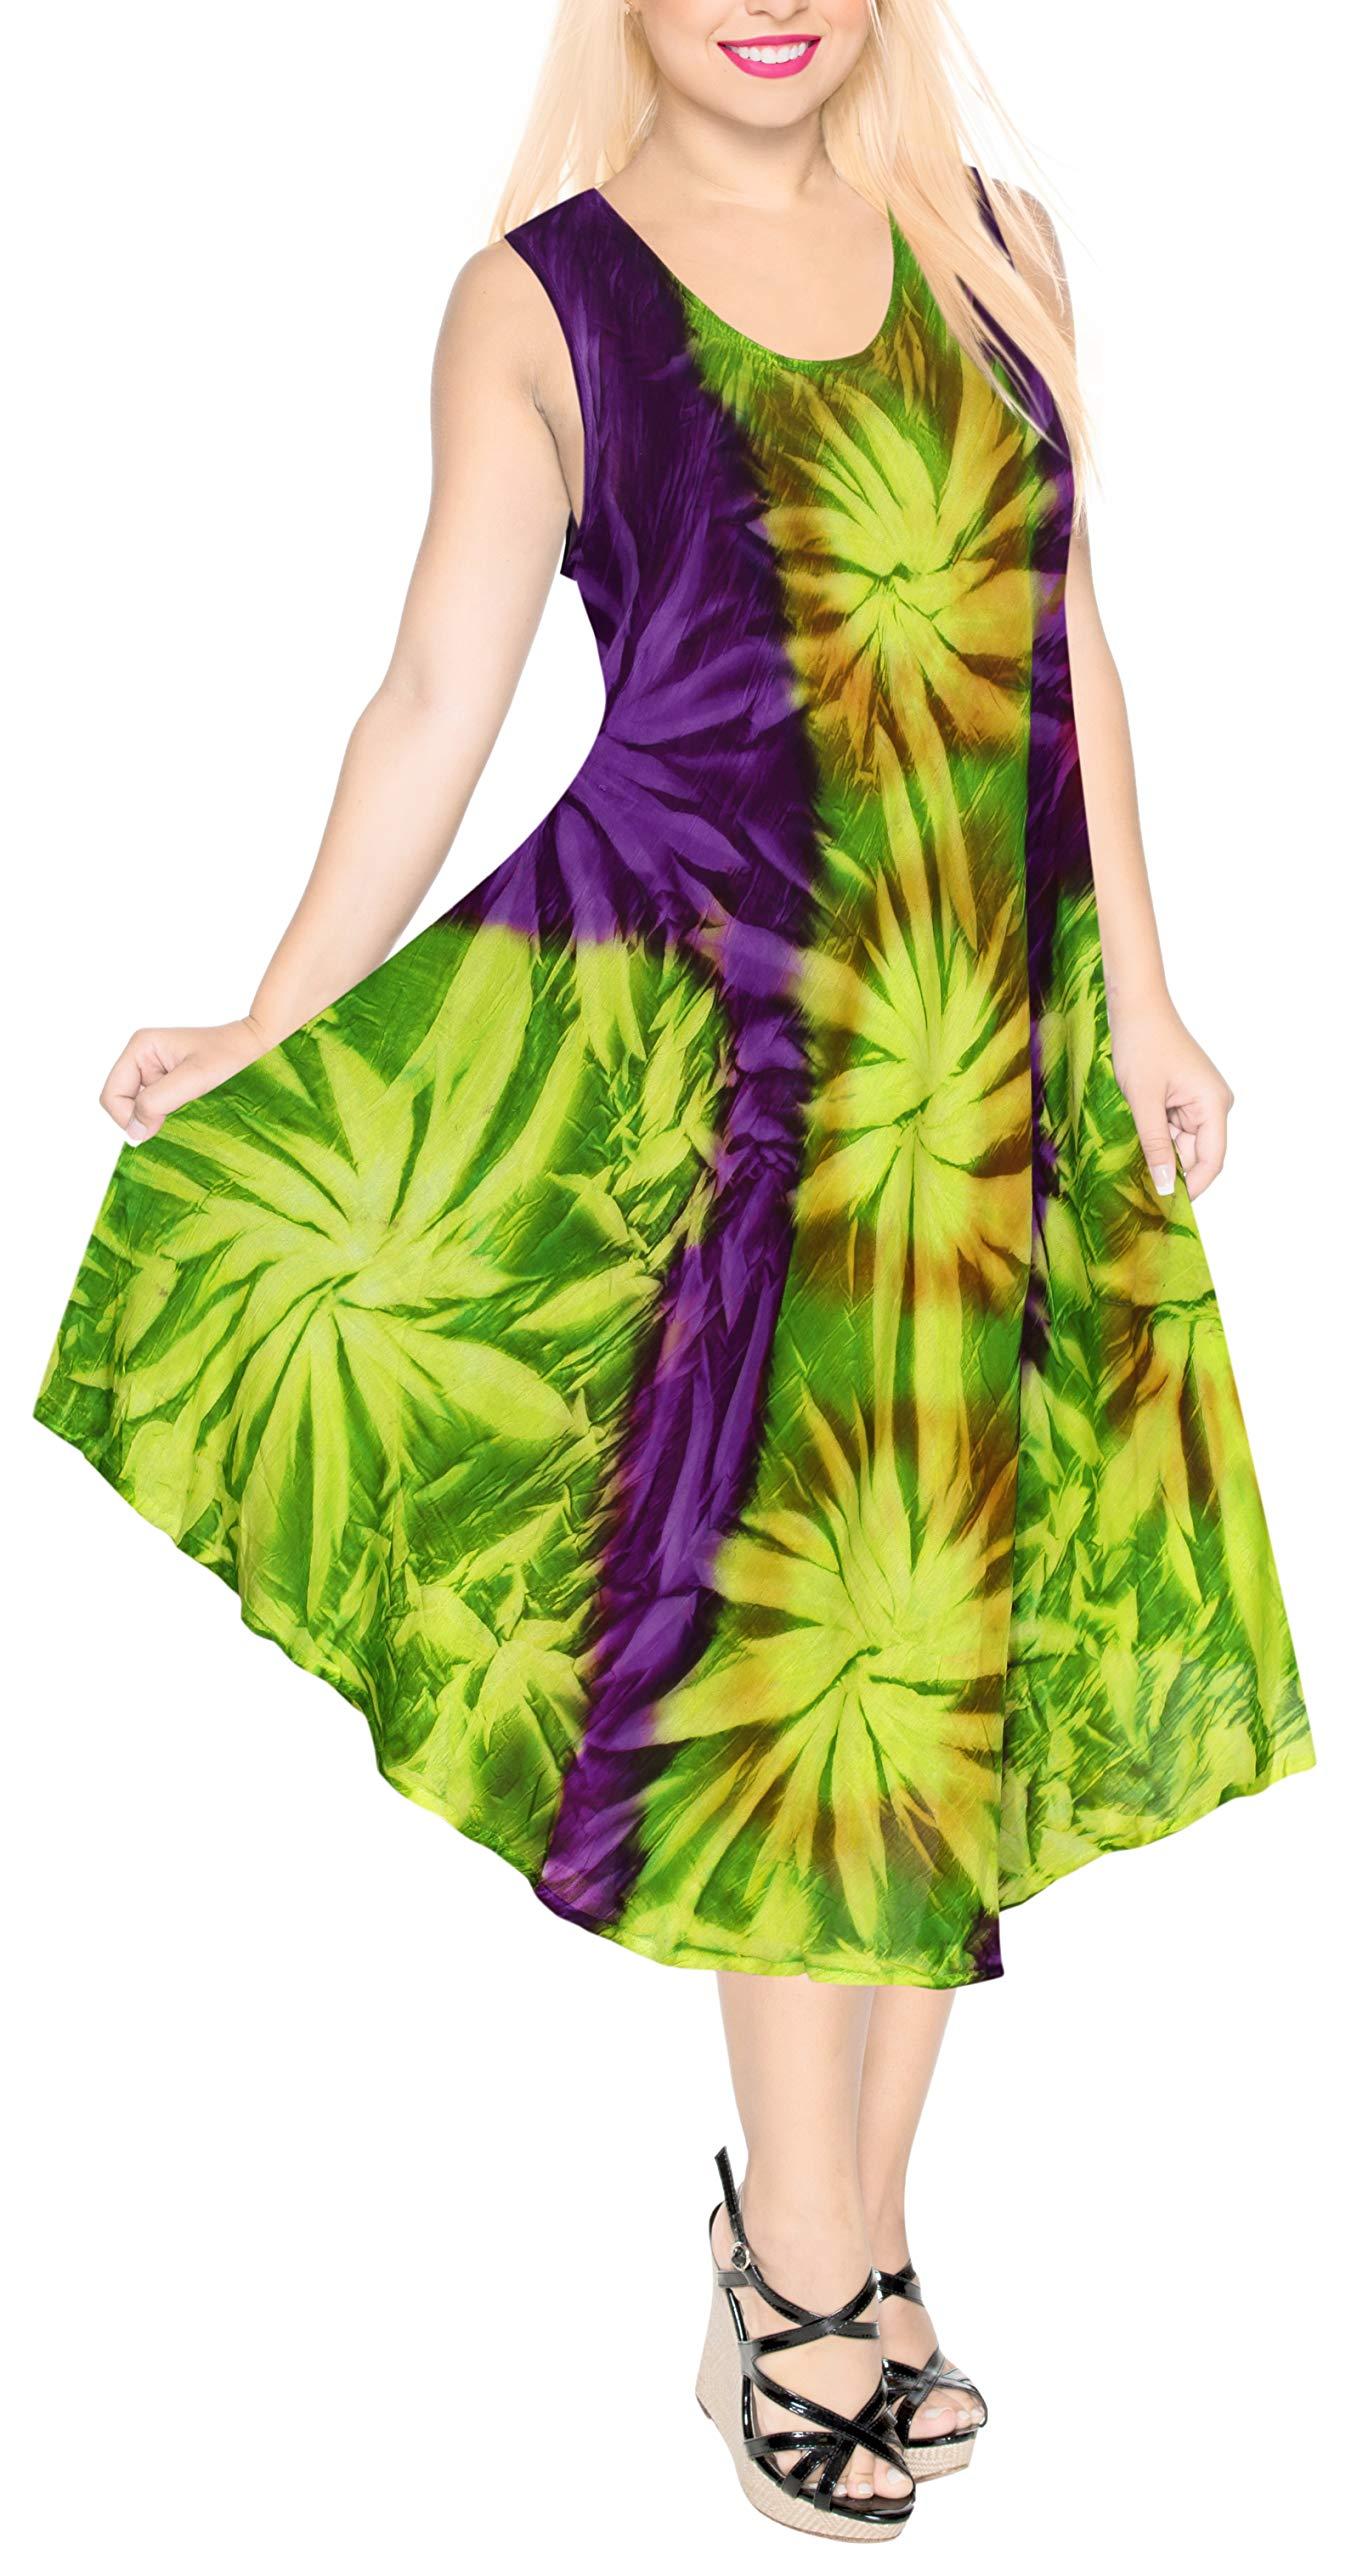 Available at Amazon: LA LEELA Women's Midi Beach Dress Swing Casual Sundress Beachwear Hand Tie Dye